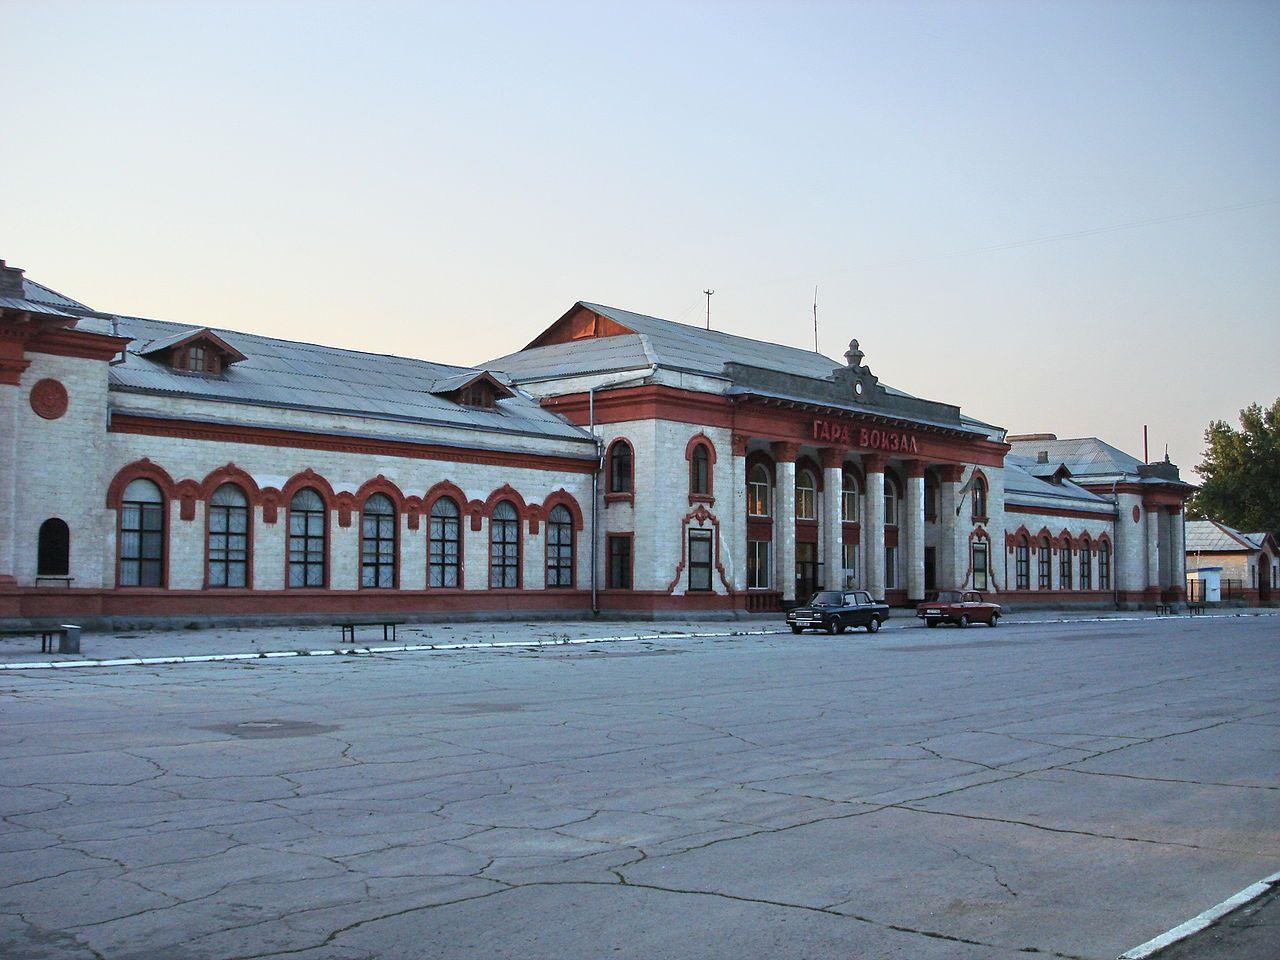 JD voksal Bendery - Bender, Moldova - Wikipedia, the free